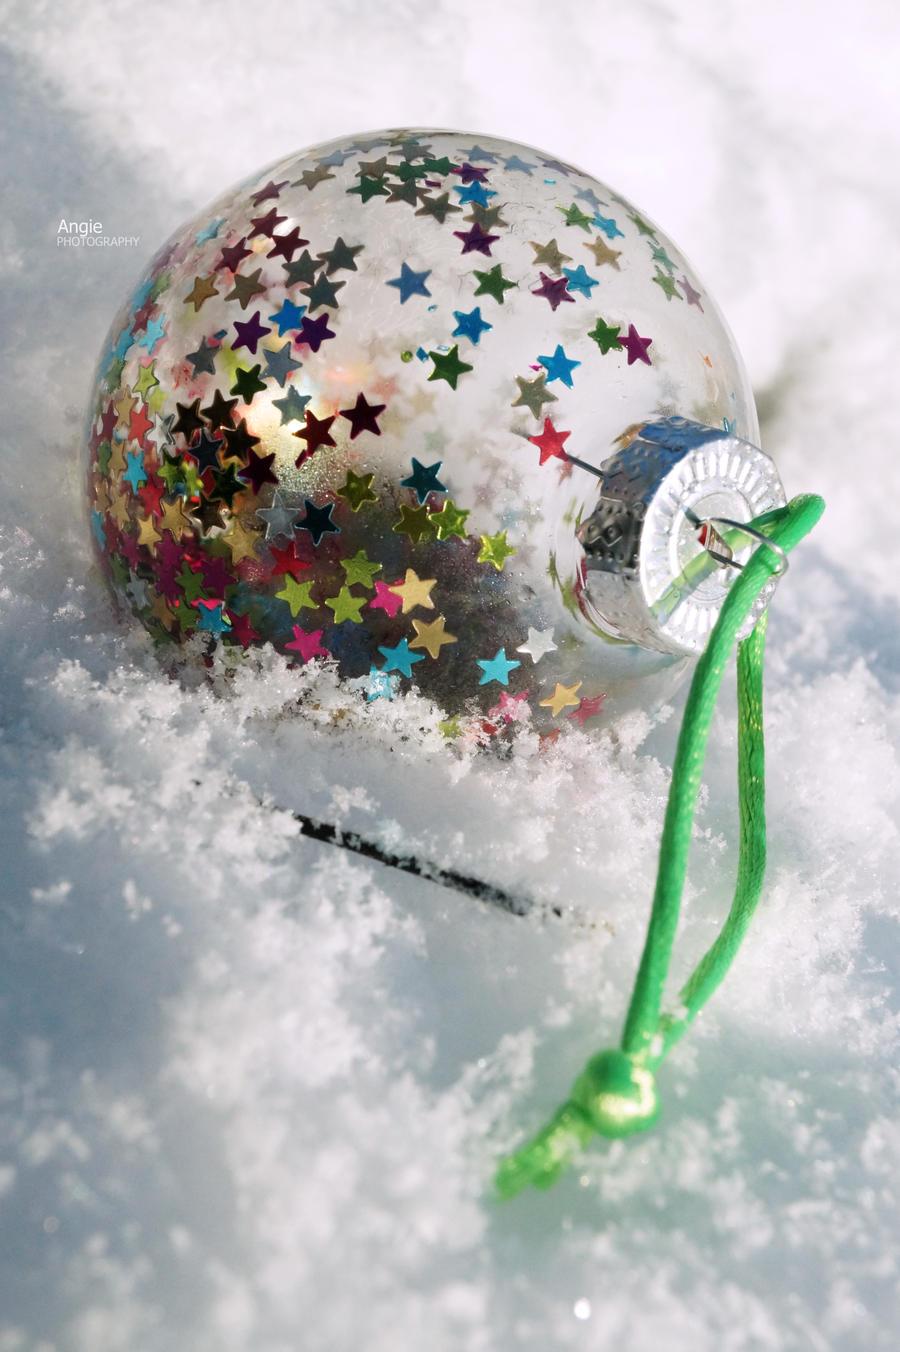 Christmass Spirit by Angie-AgnieszkaB